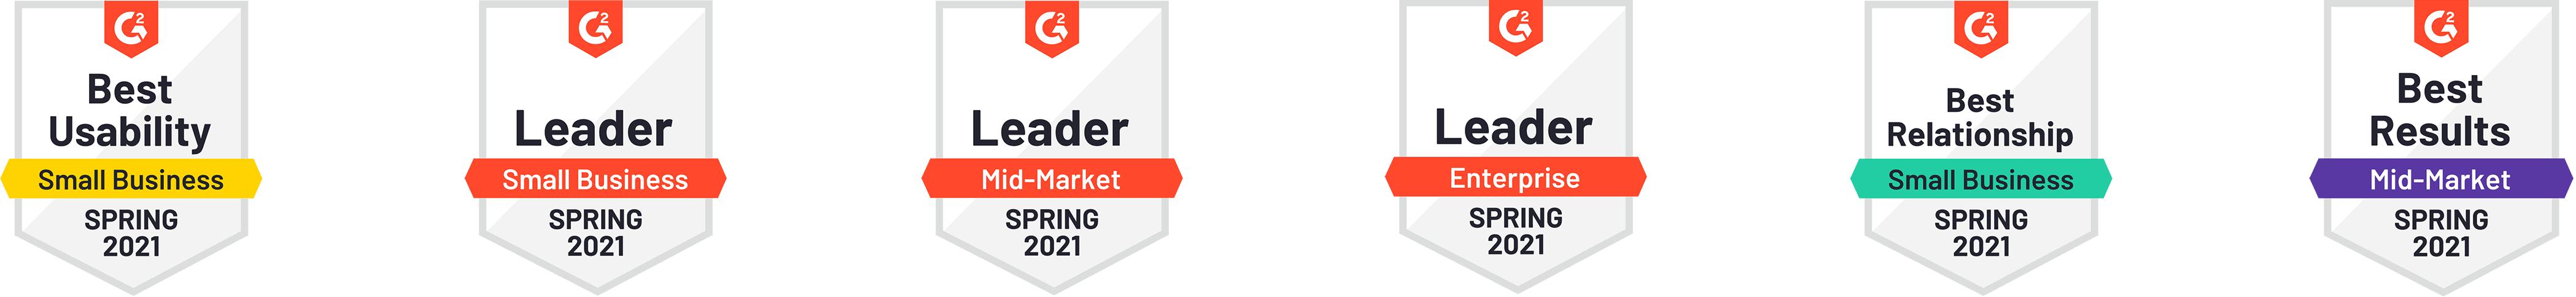 badges_row-2021-spring-1